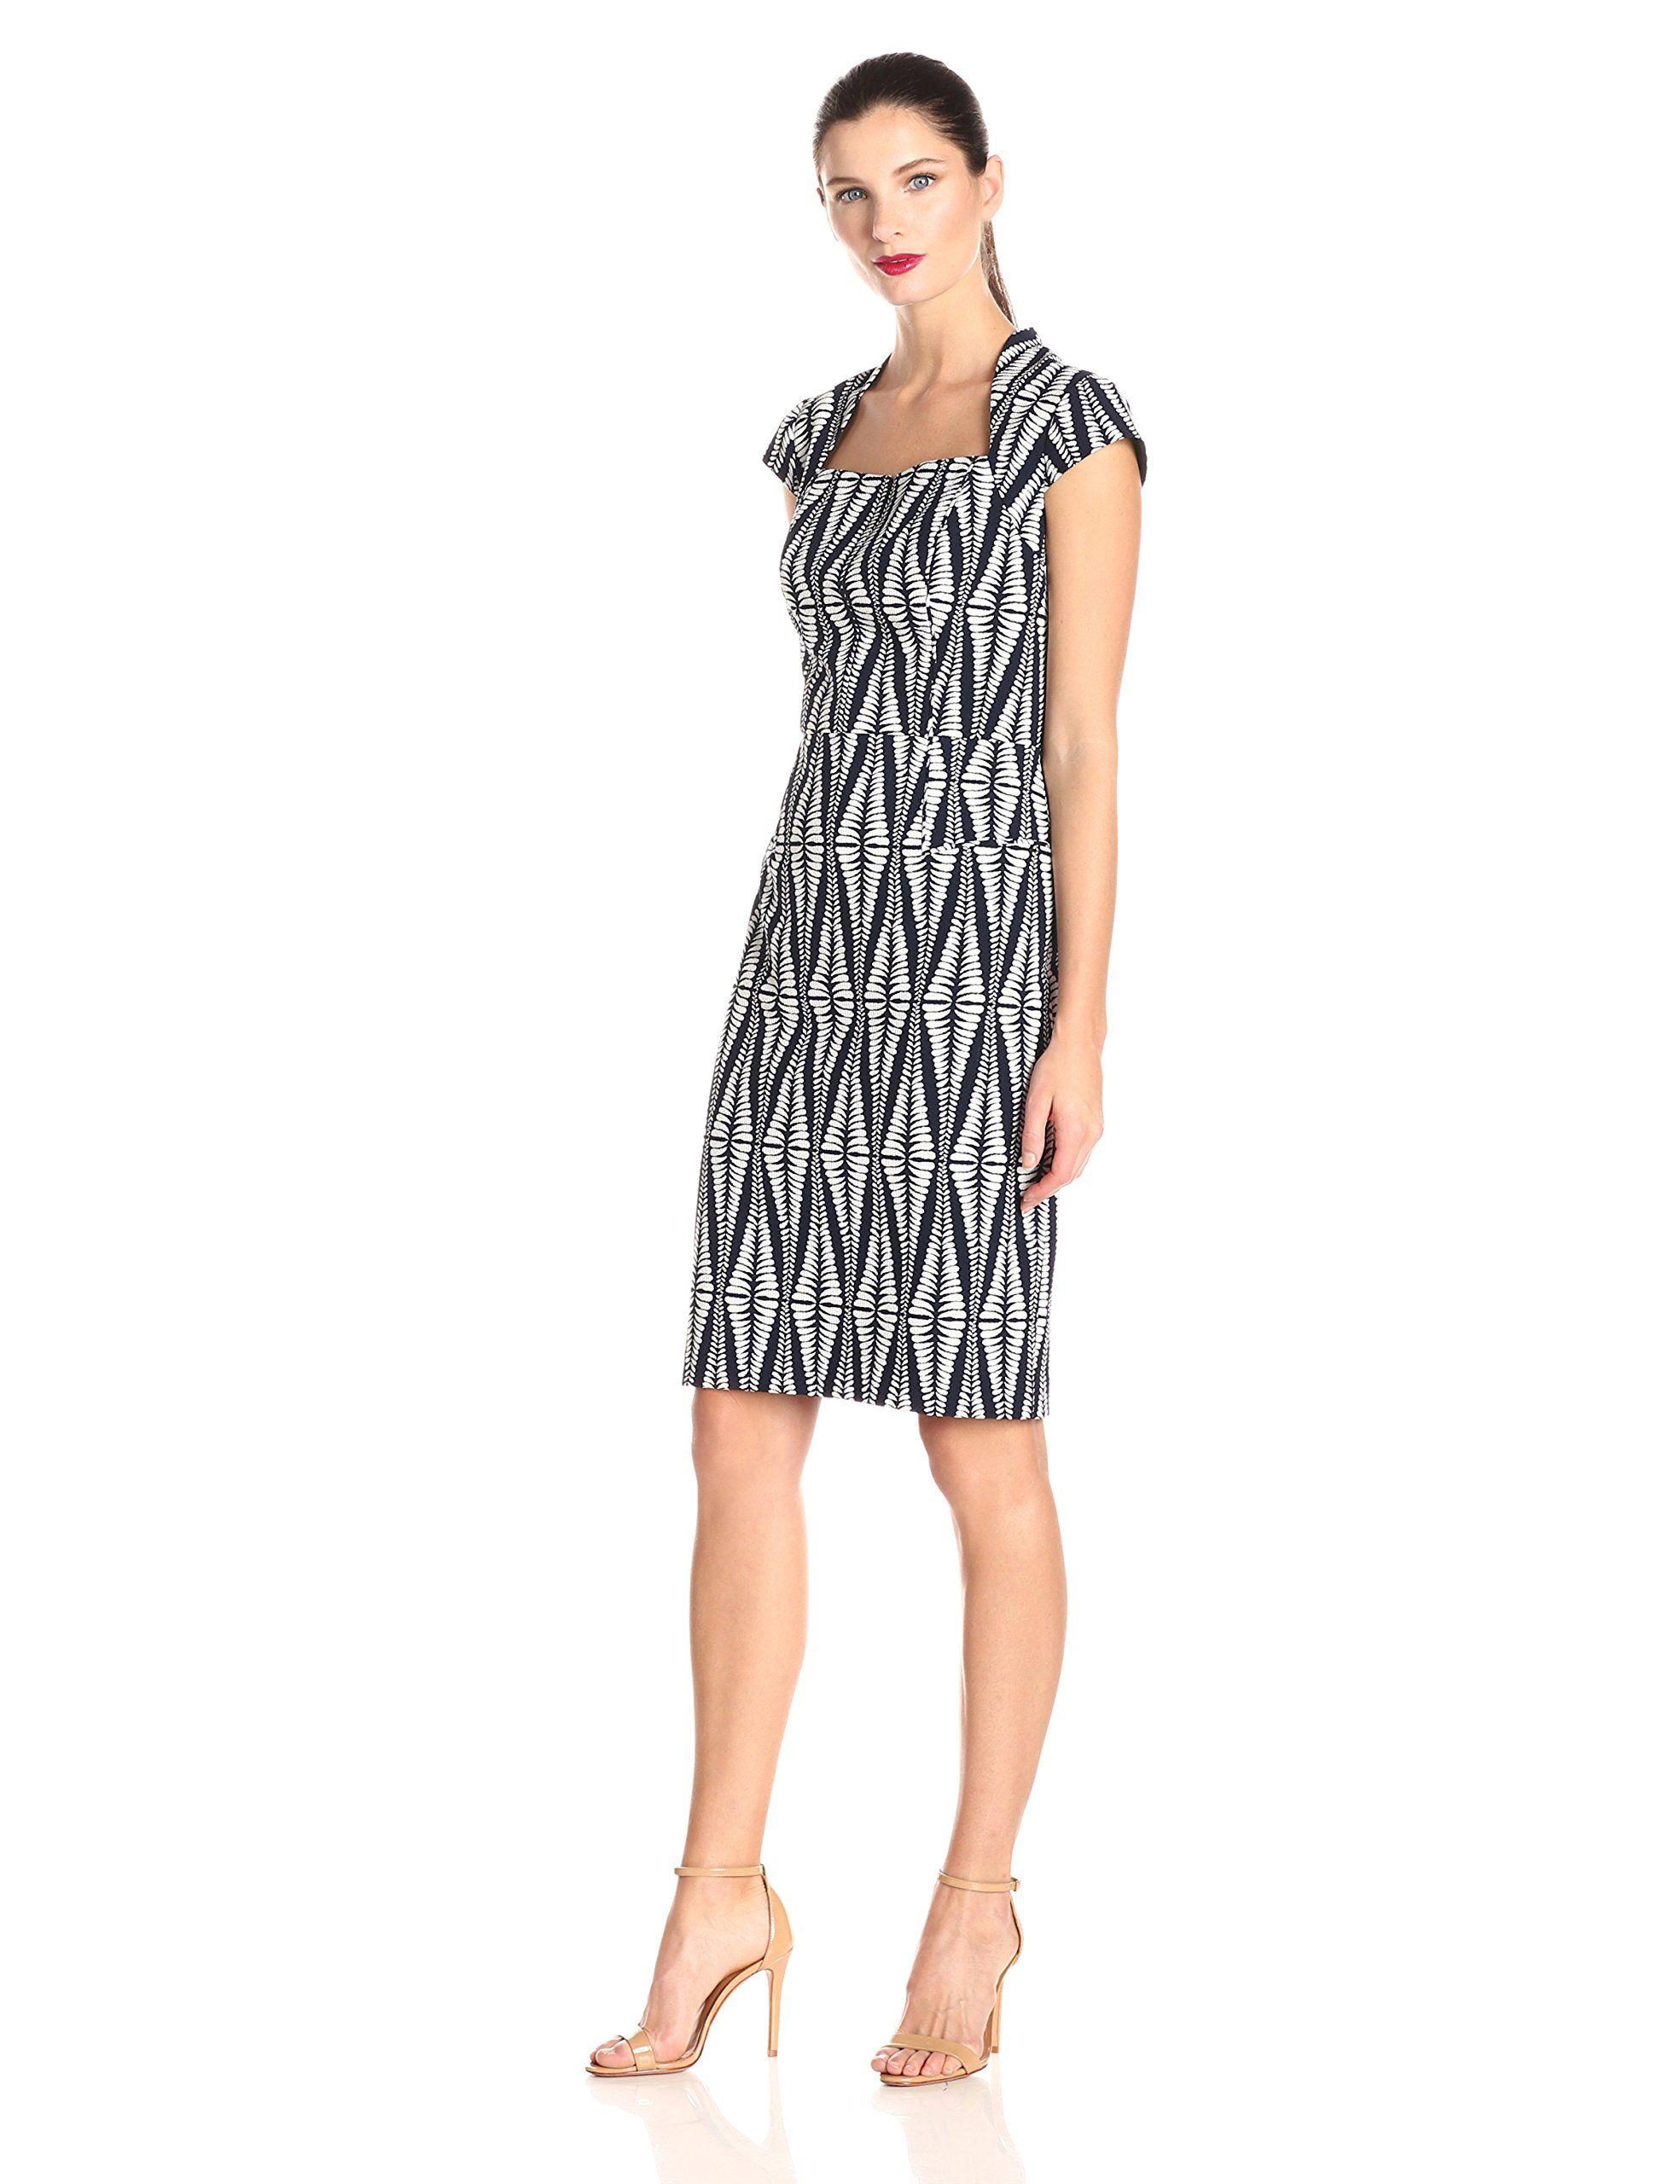 8e2236fb9bd Adrianna Papell Women s Printed Sheath Dress at Amazon Women s Clothing  store